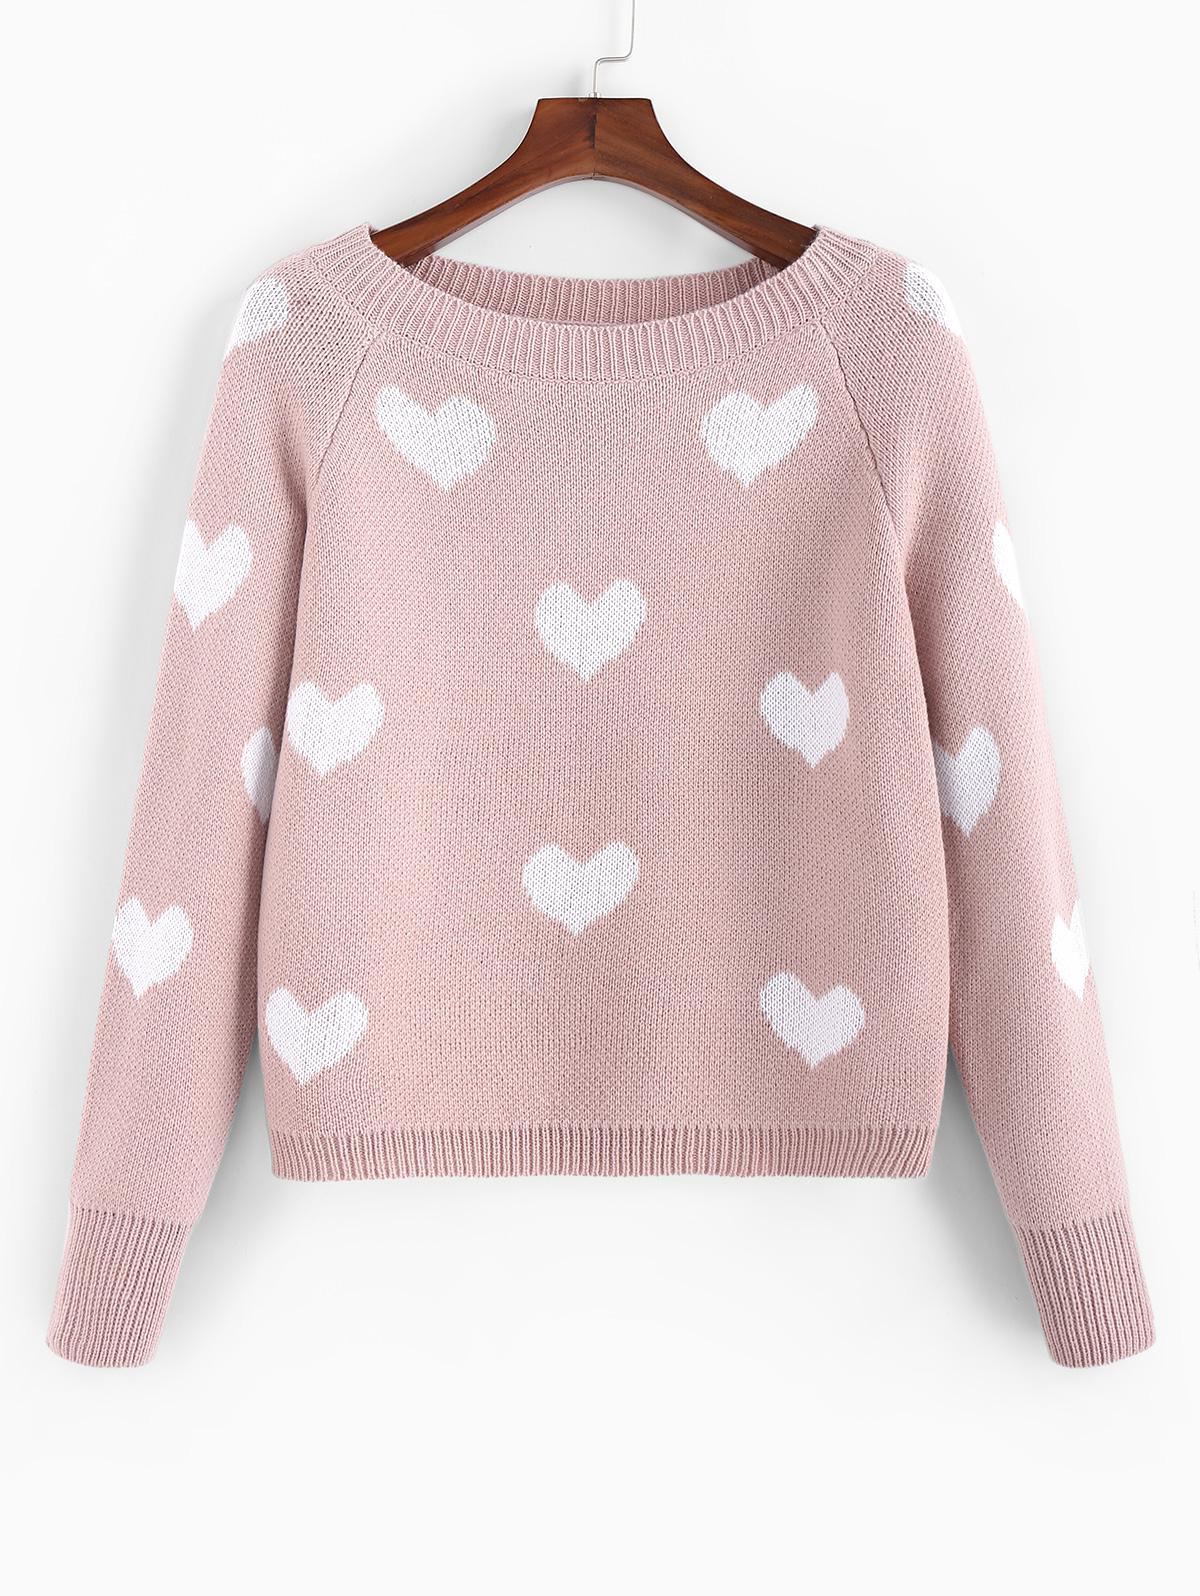 ZAFUL Heart Graphic Raglan Sleeve Textured Sweater